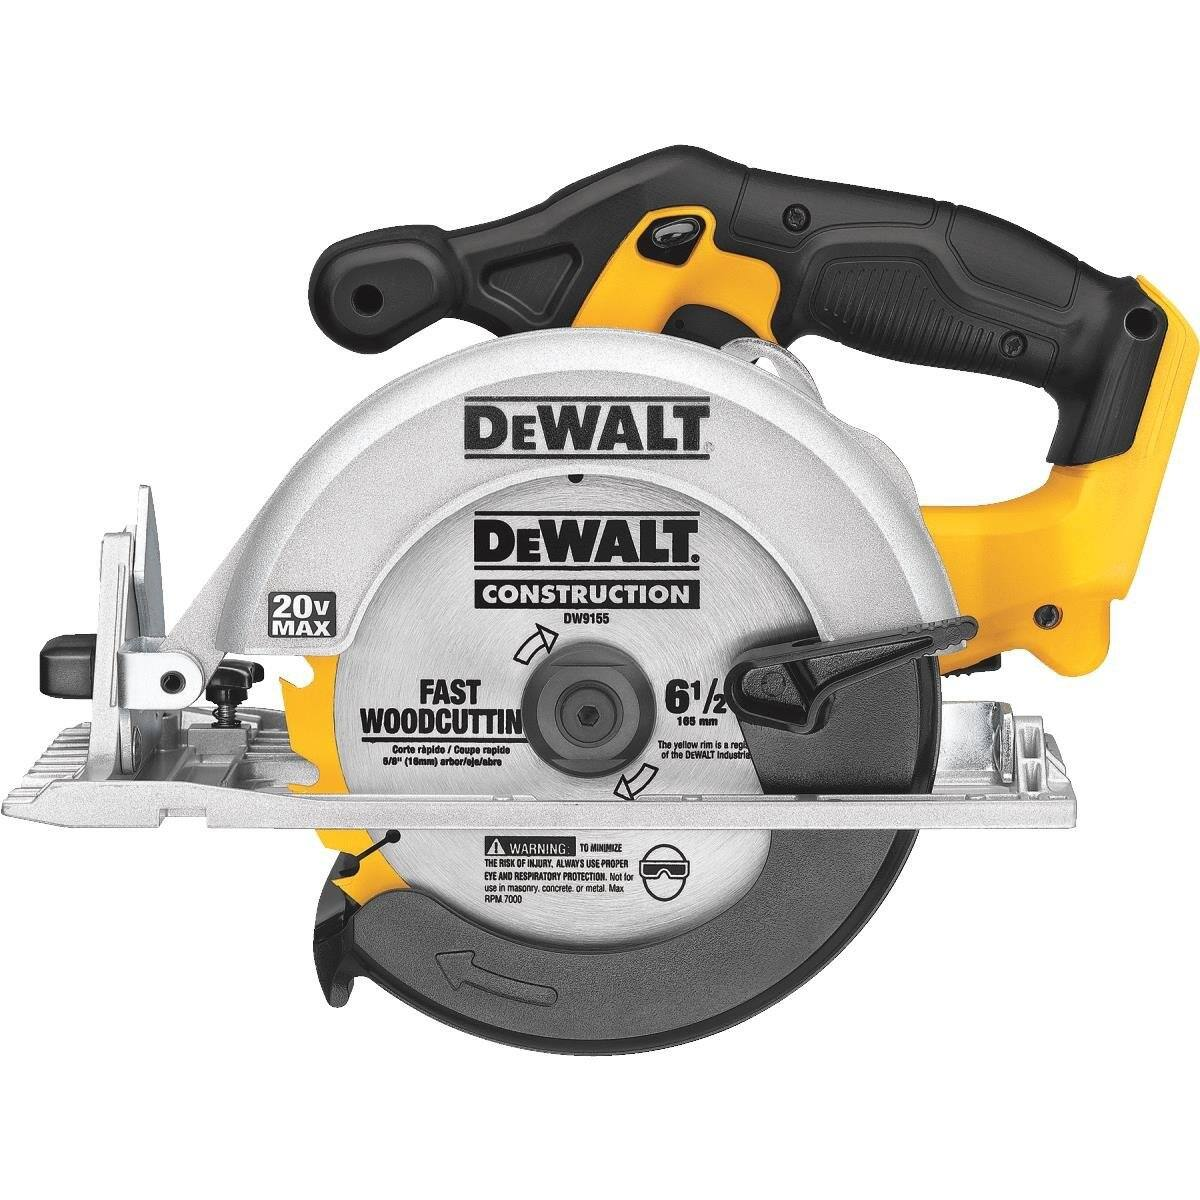 DEWALT DCS391B 20-Volt MAX Li-Ion Circular Saw, Tool Only + DEWALT DCB200C Battery Pack and Charger $119